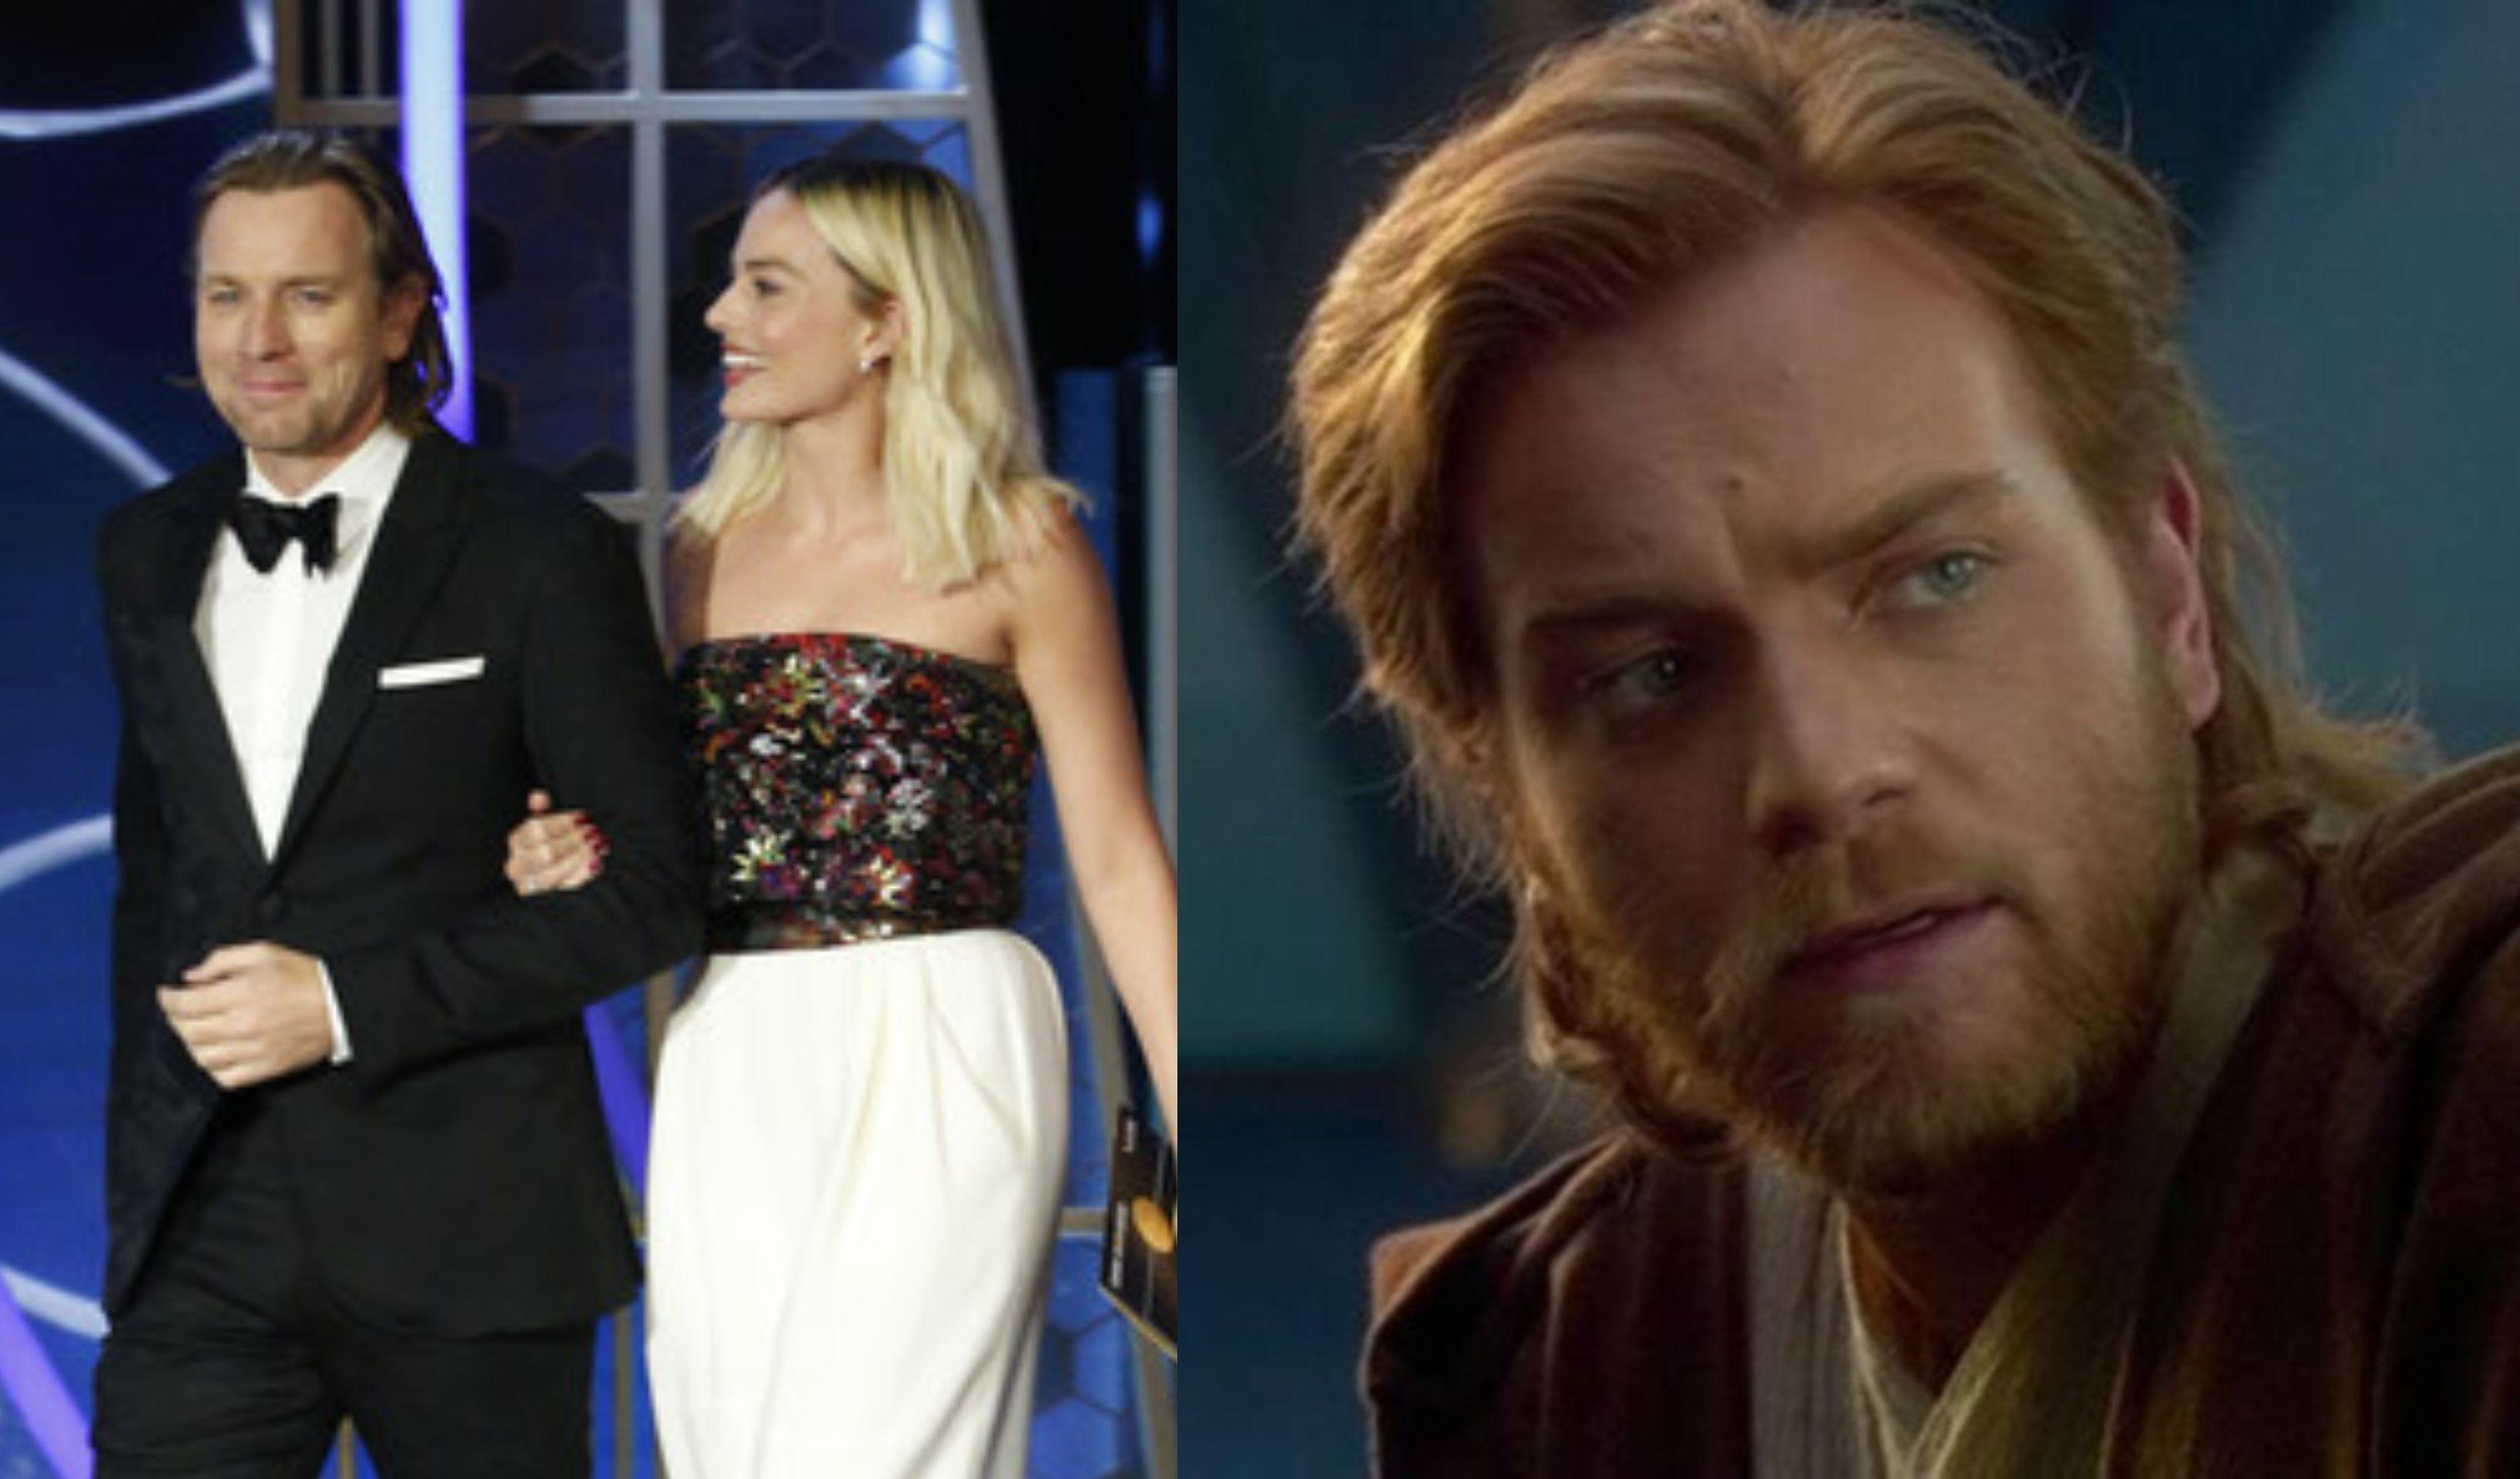 Ewan Mcgregor Shows Off Obi Wan Length Hair During 2020 Golden Globes In 2020 Ewan Mcgregor Obi Wan Hair Lengths